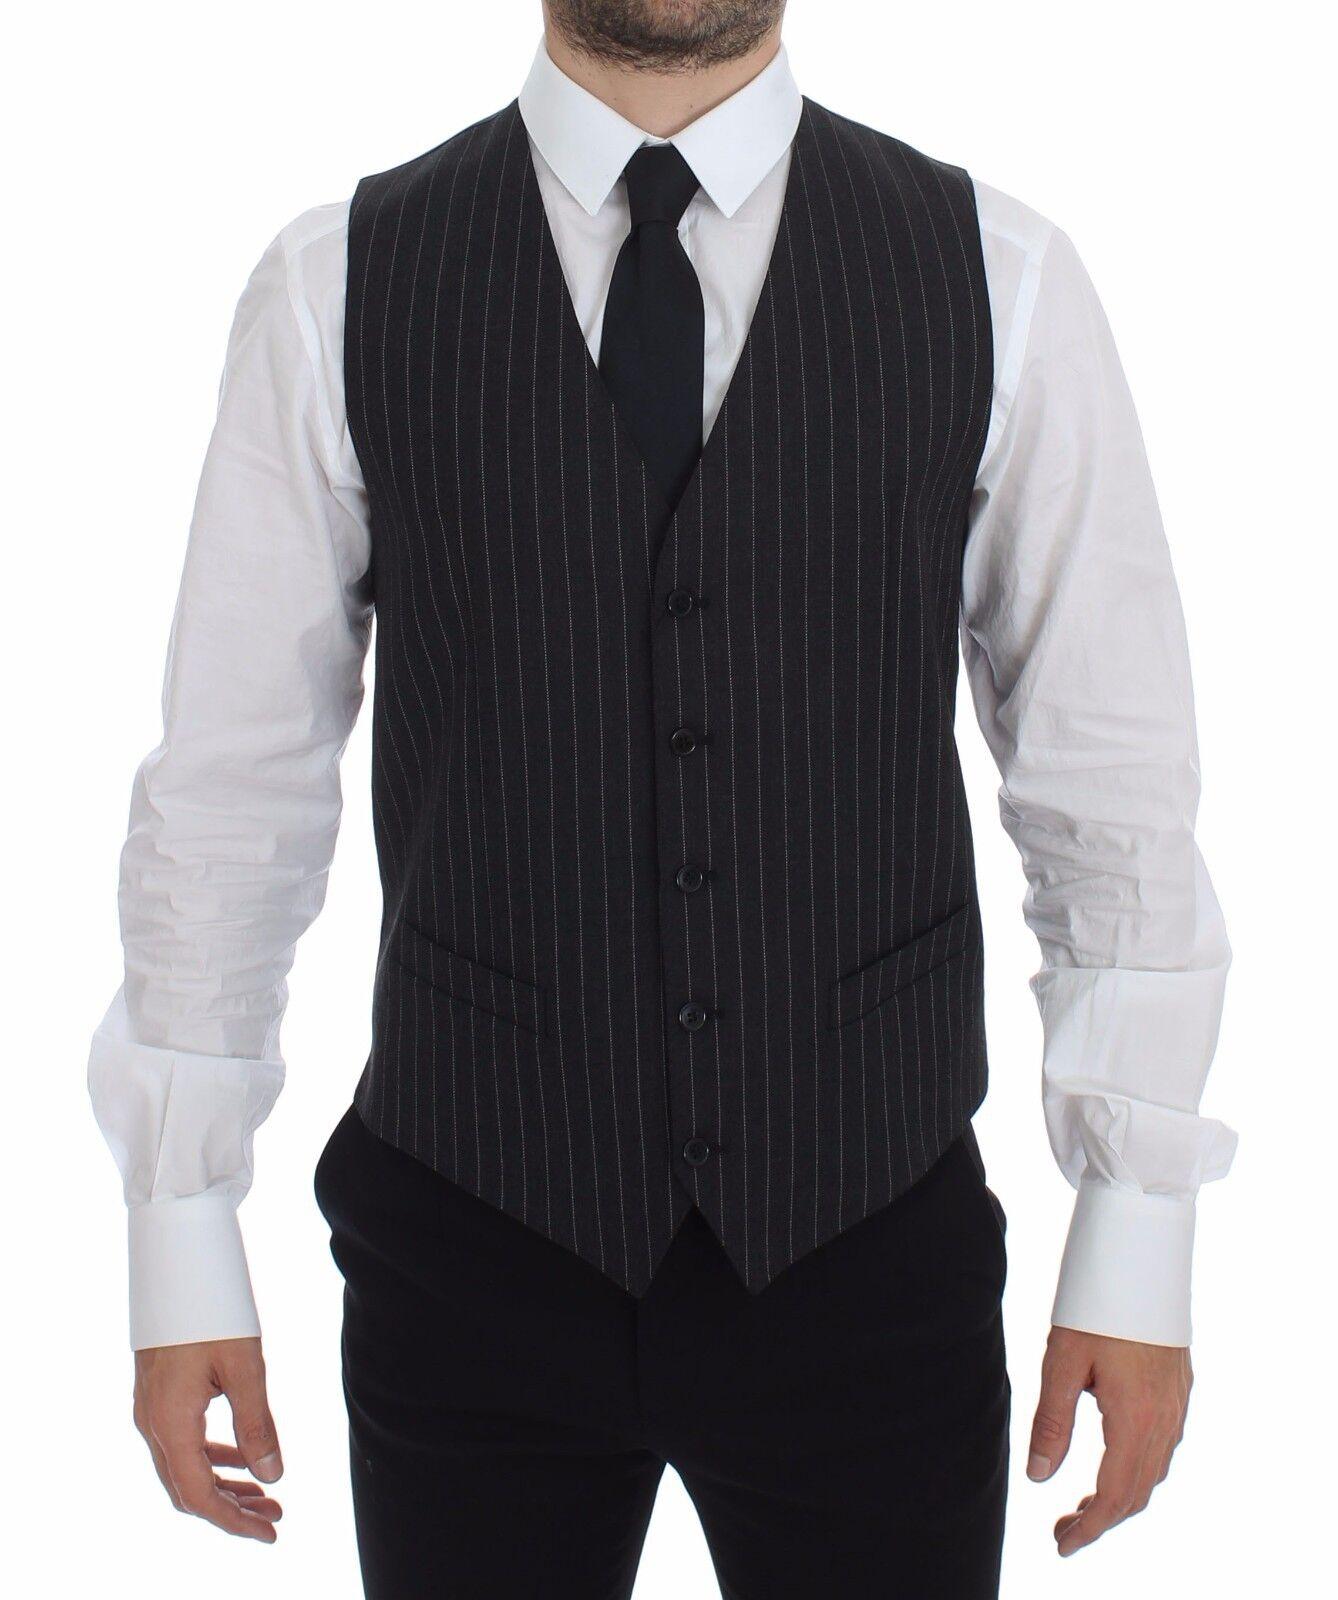 NWT 500 DOLCE & GABBANA grau Striped Wool Logo Vest Gilet Weste IT48 / US38 /M